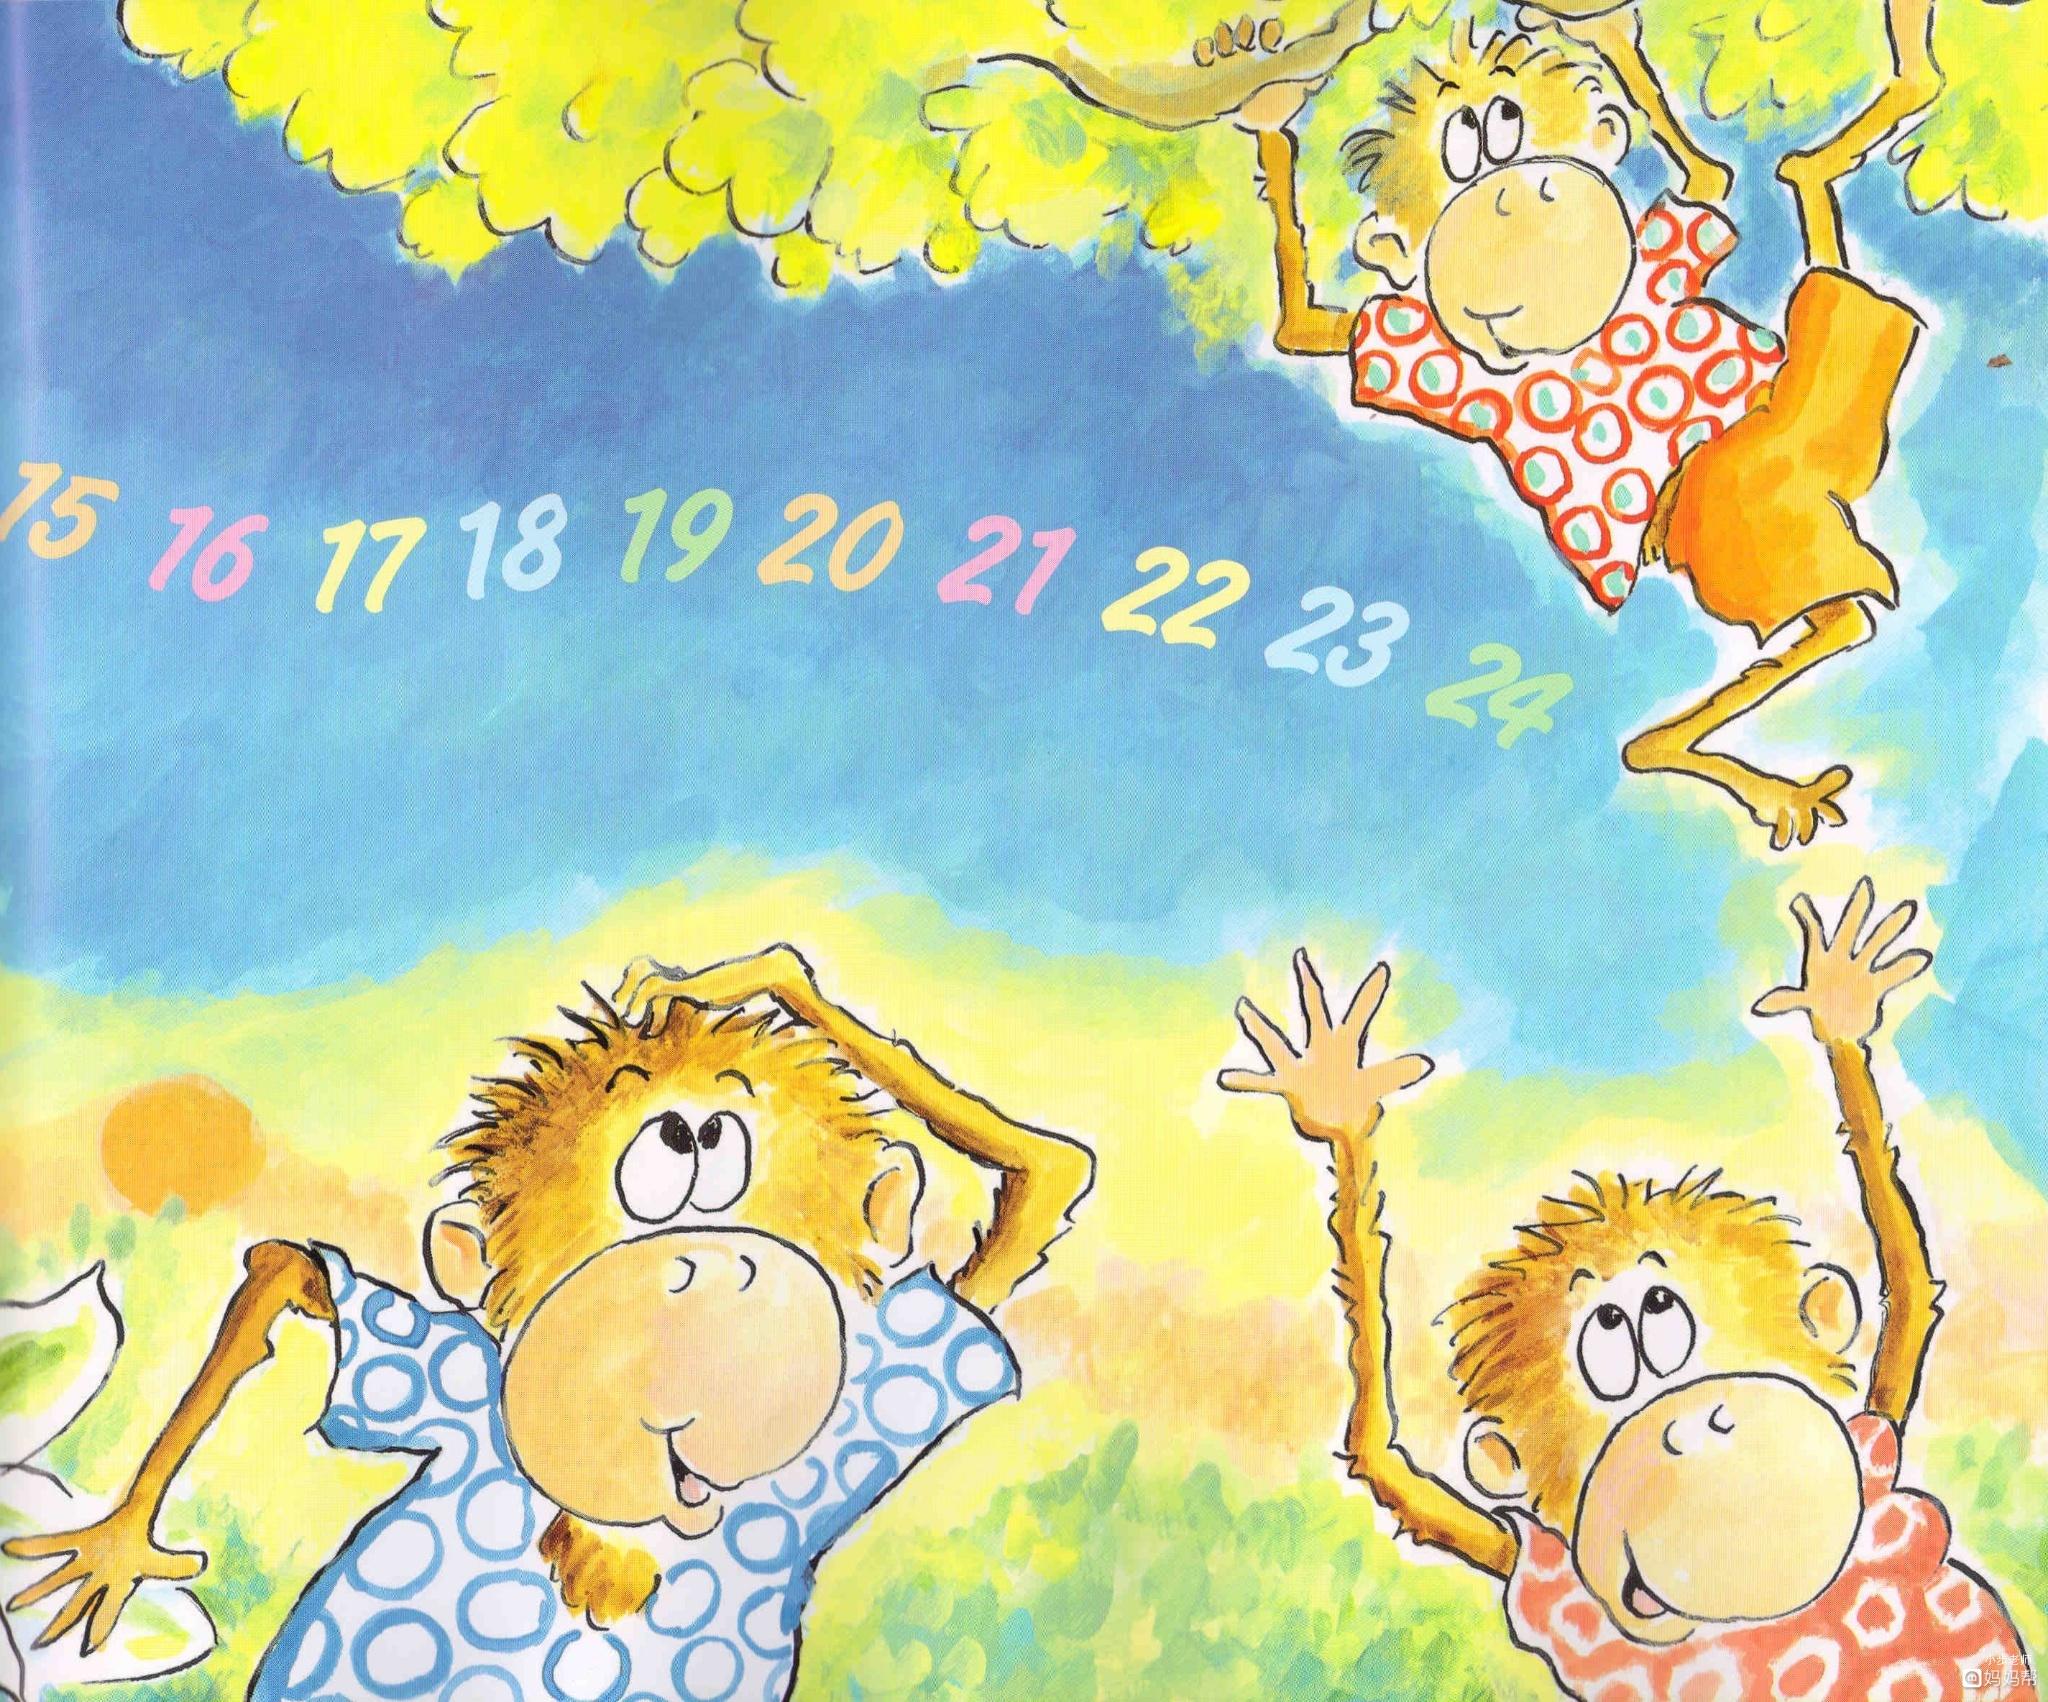 经典英语绘本故事&英文歌曲《five little monkeys play hide and see